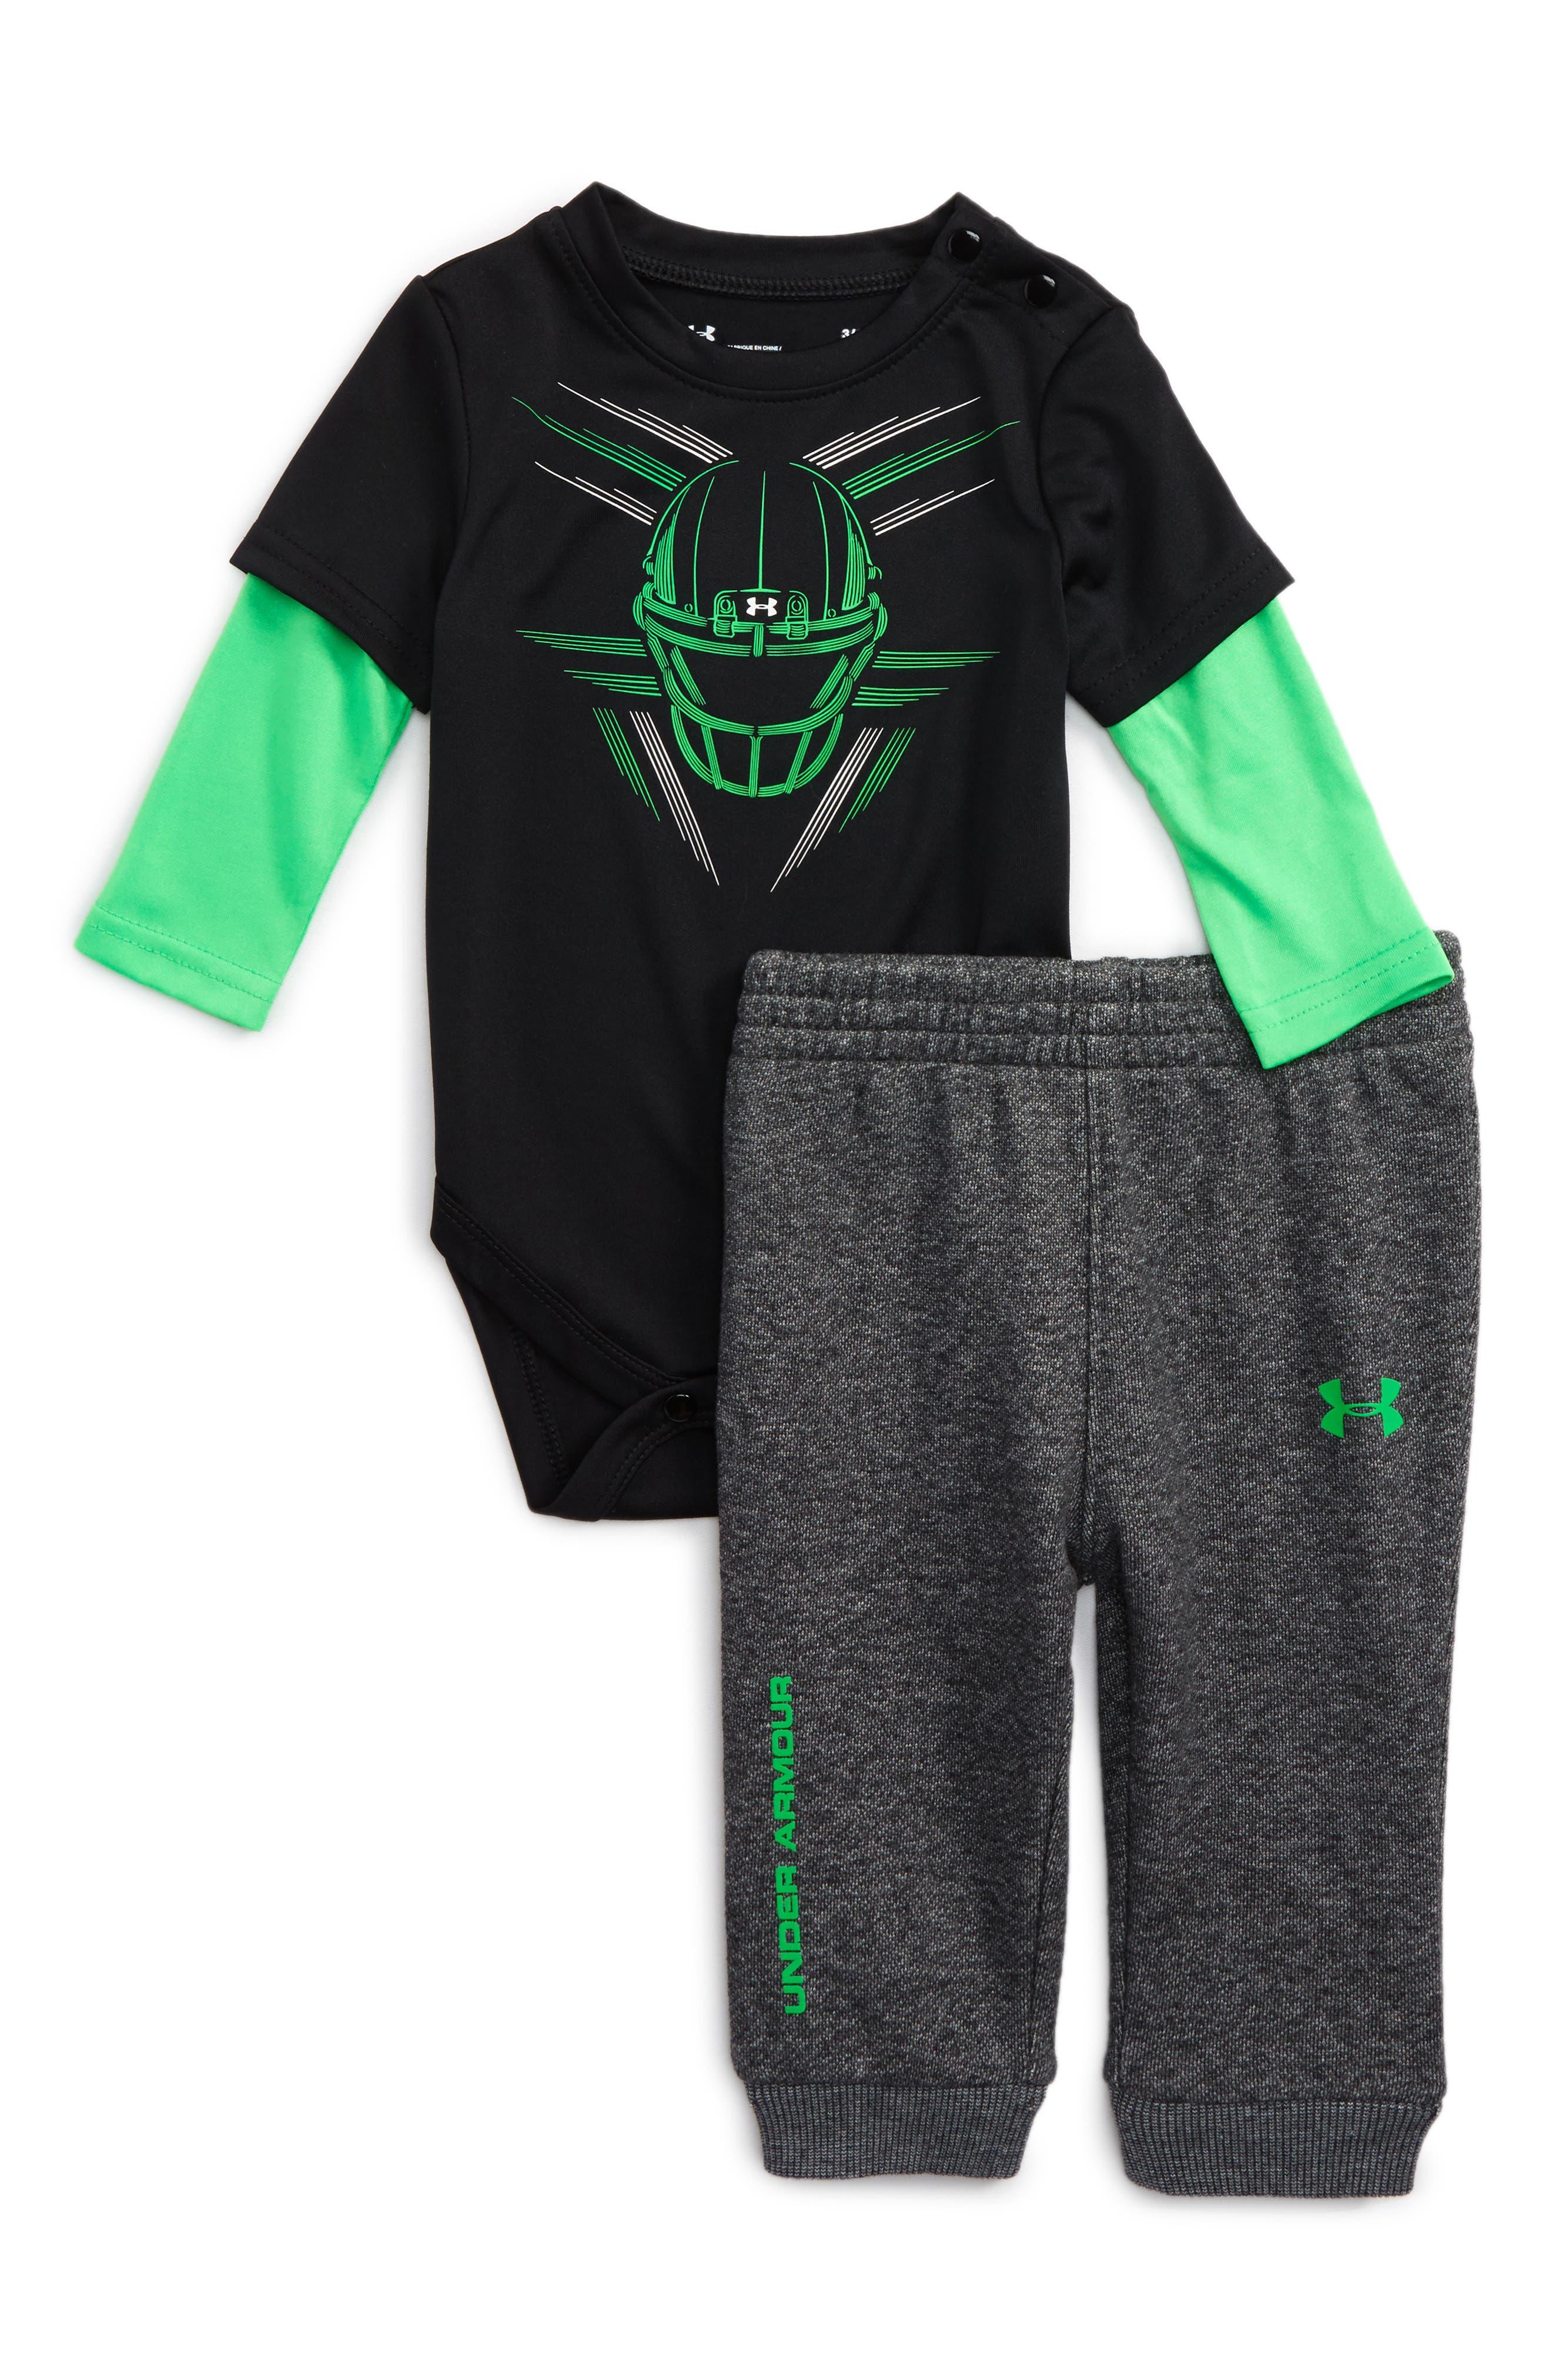 Main Image - Under Armour Digi Helmet Bodysuit & Pants Set (Baby Boys)